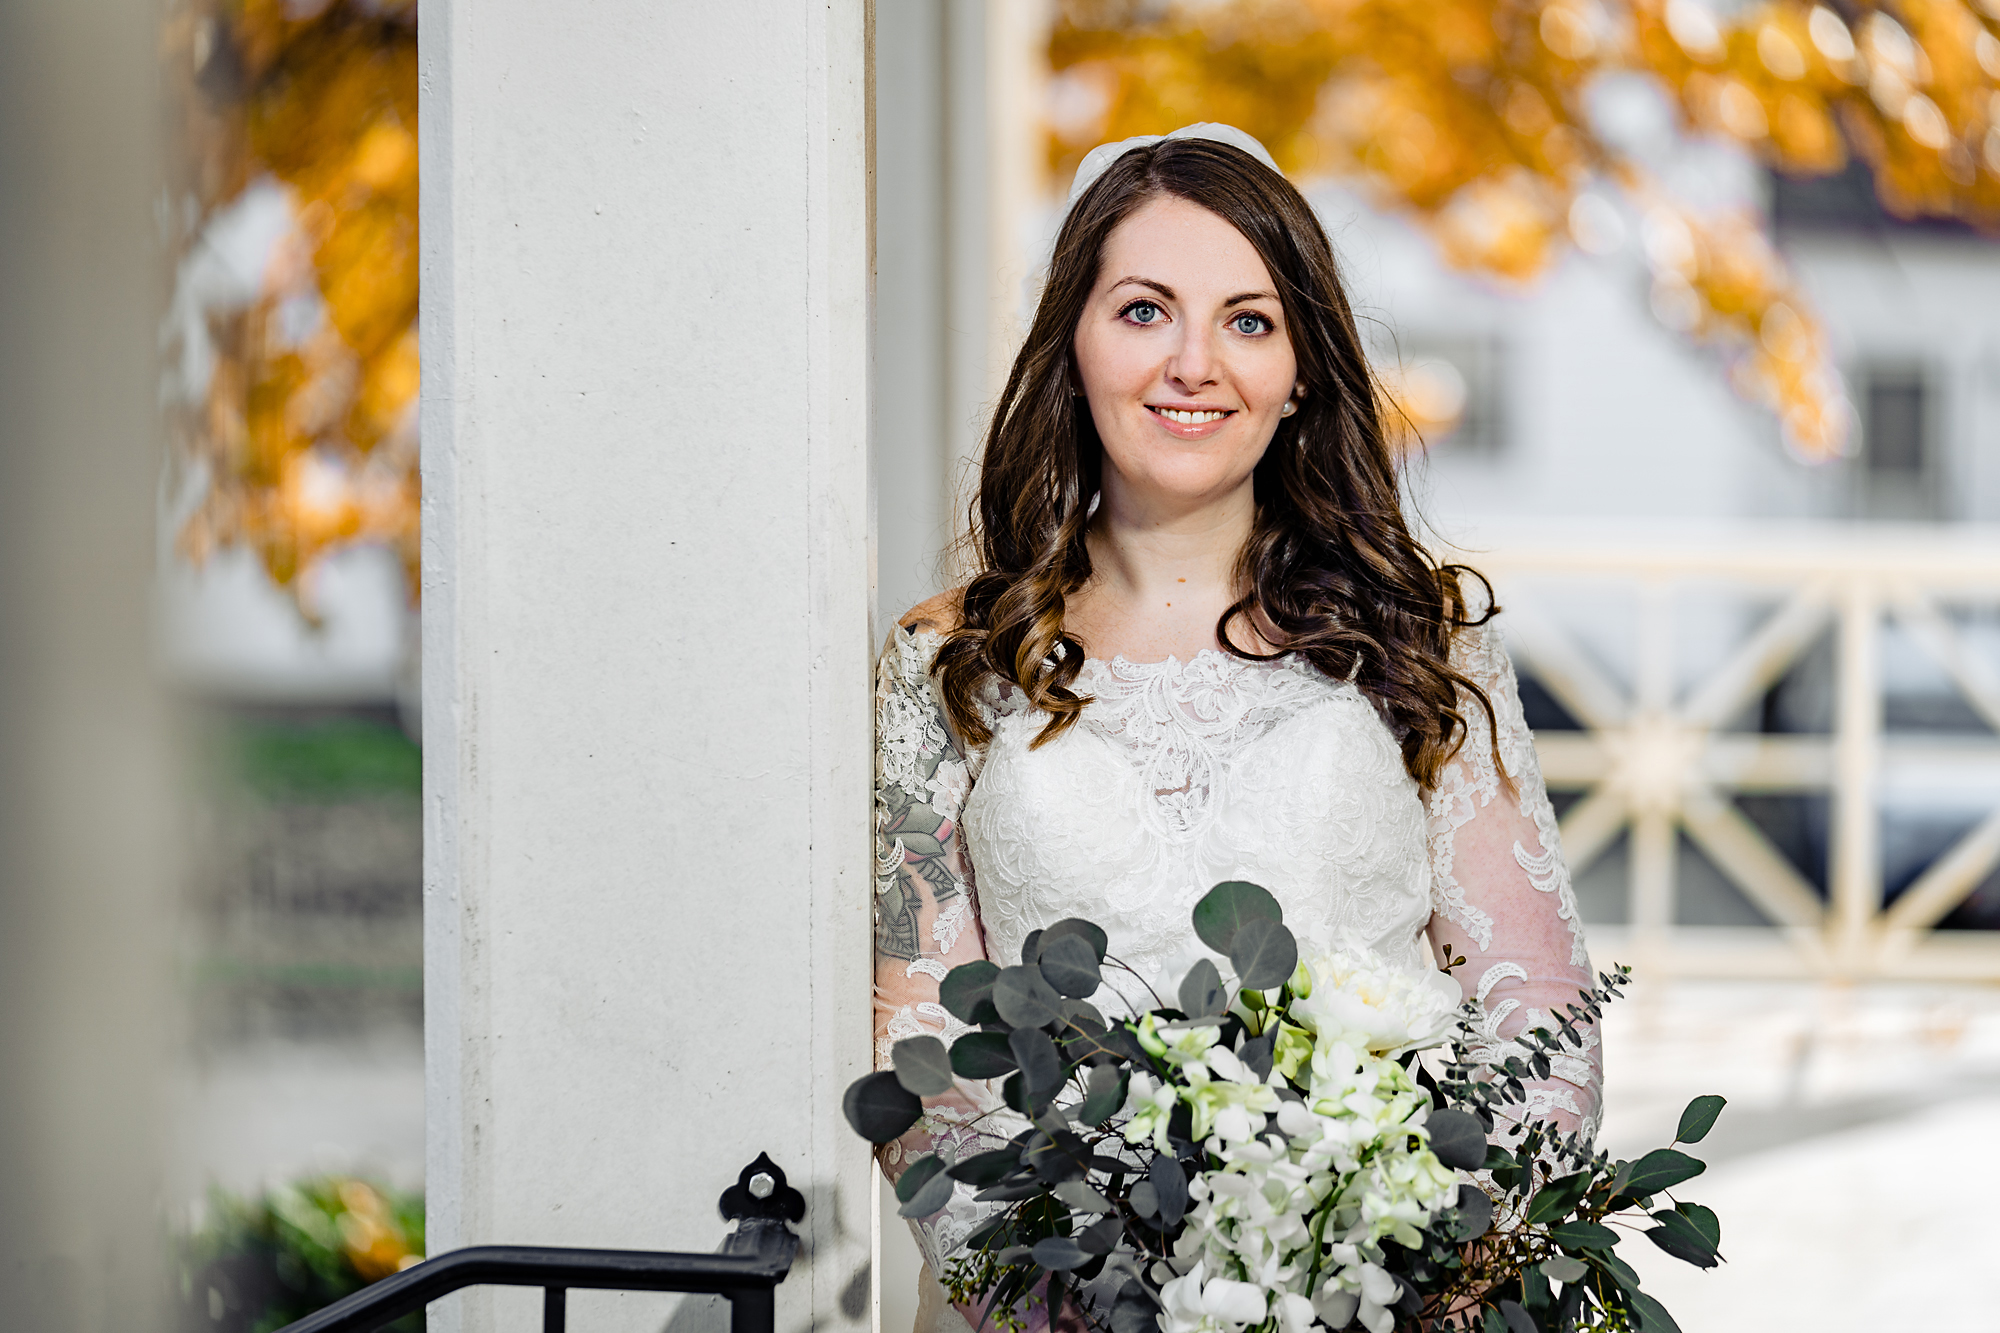 Oxford-Community-Arts-Center-Wedding-Photography-3.jpg